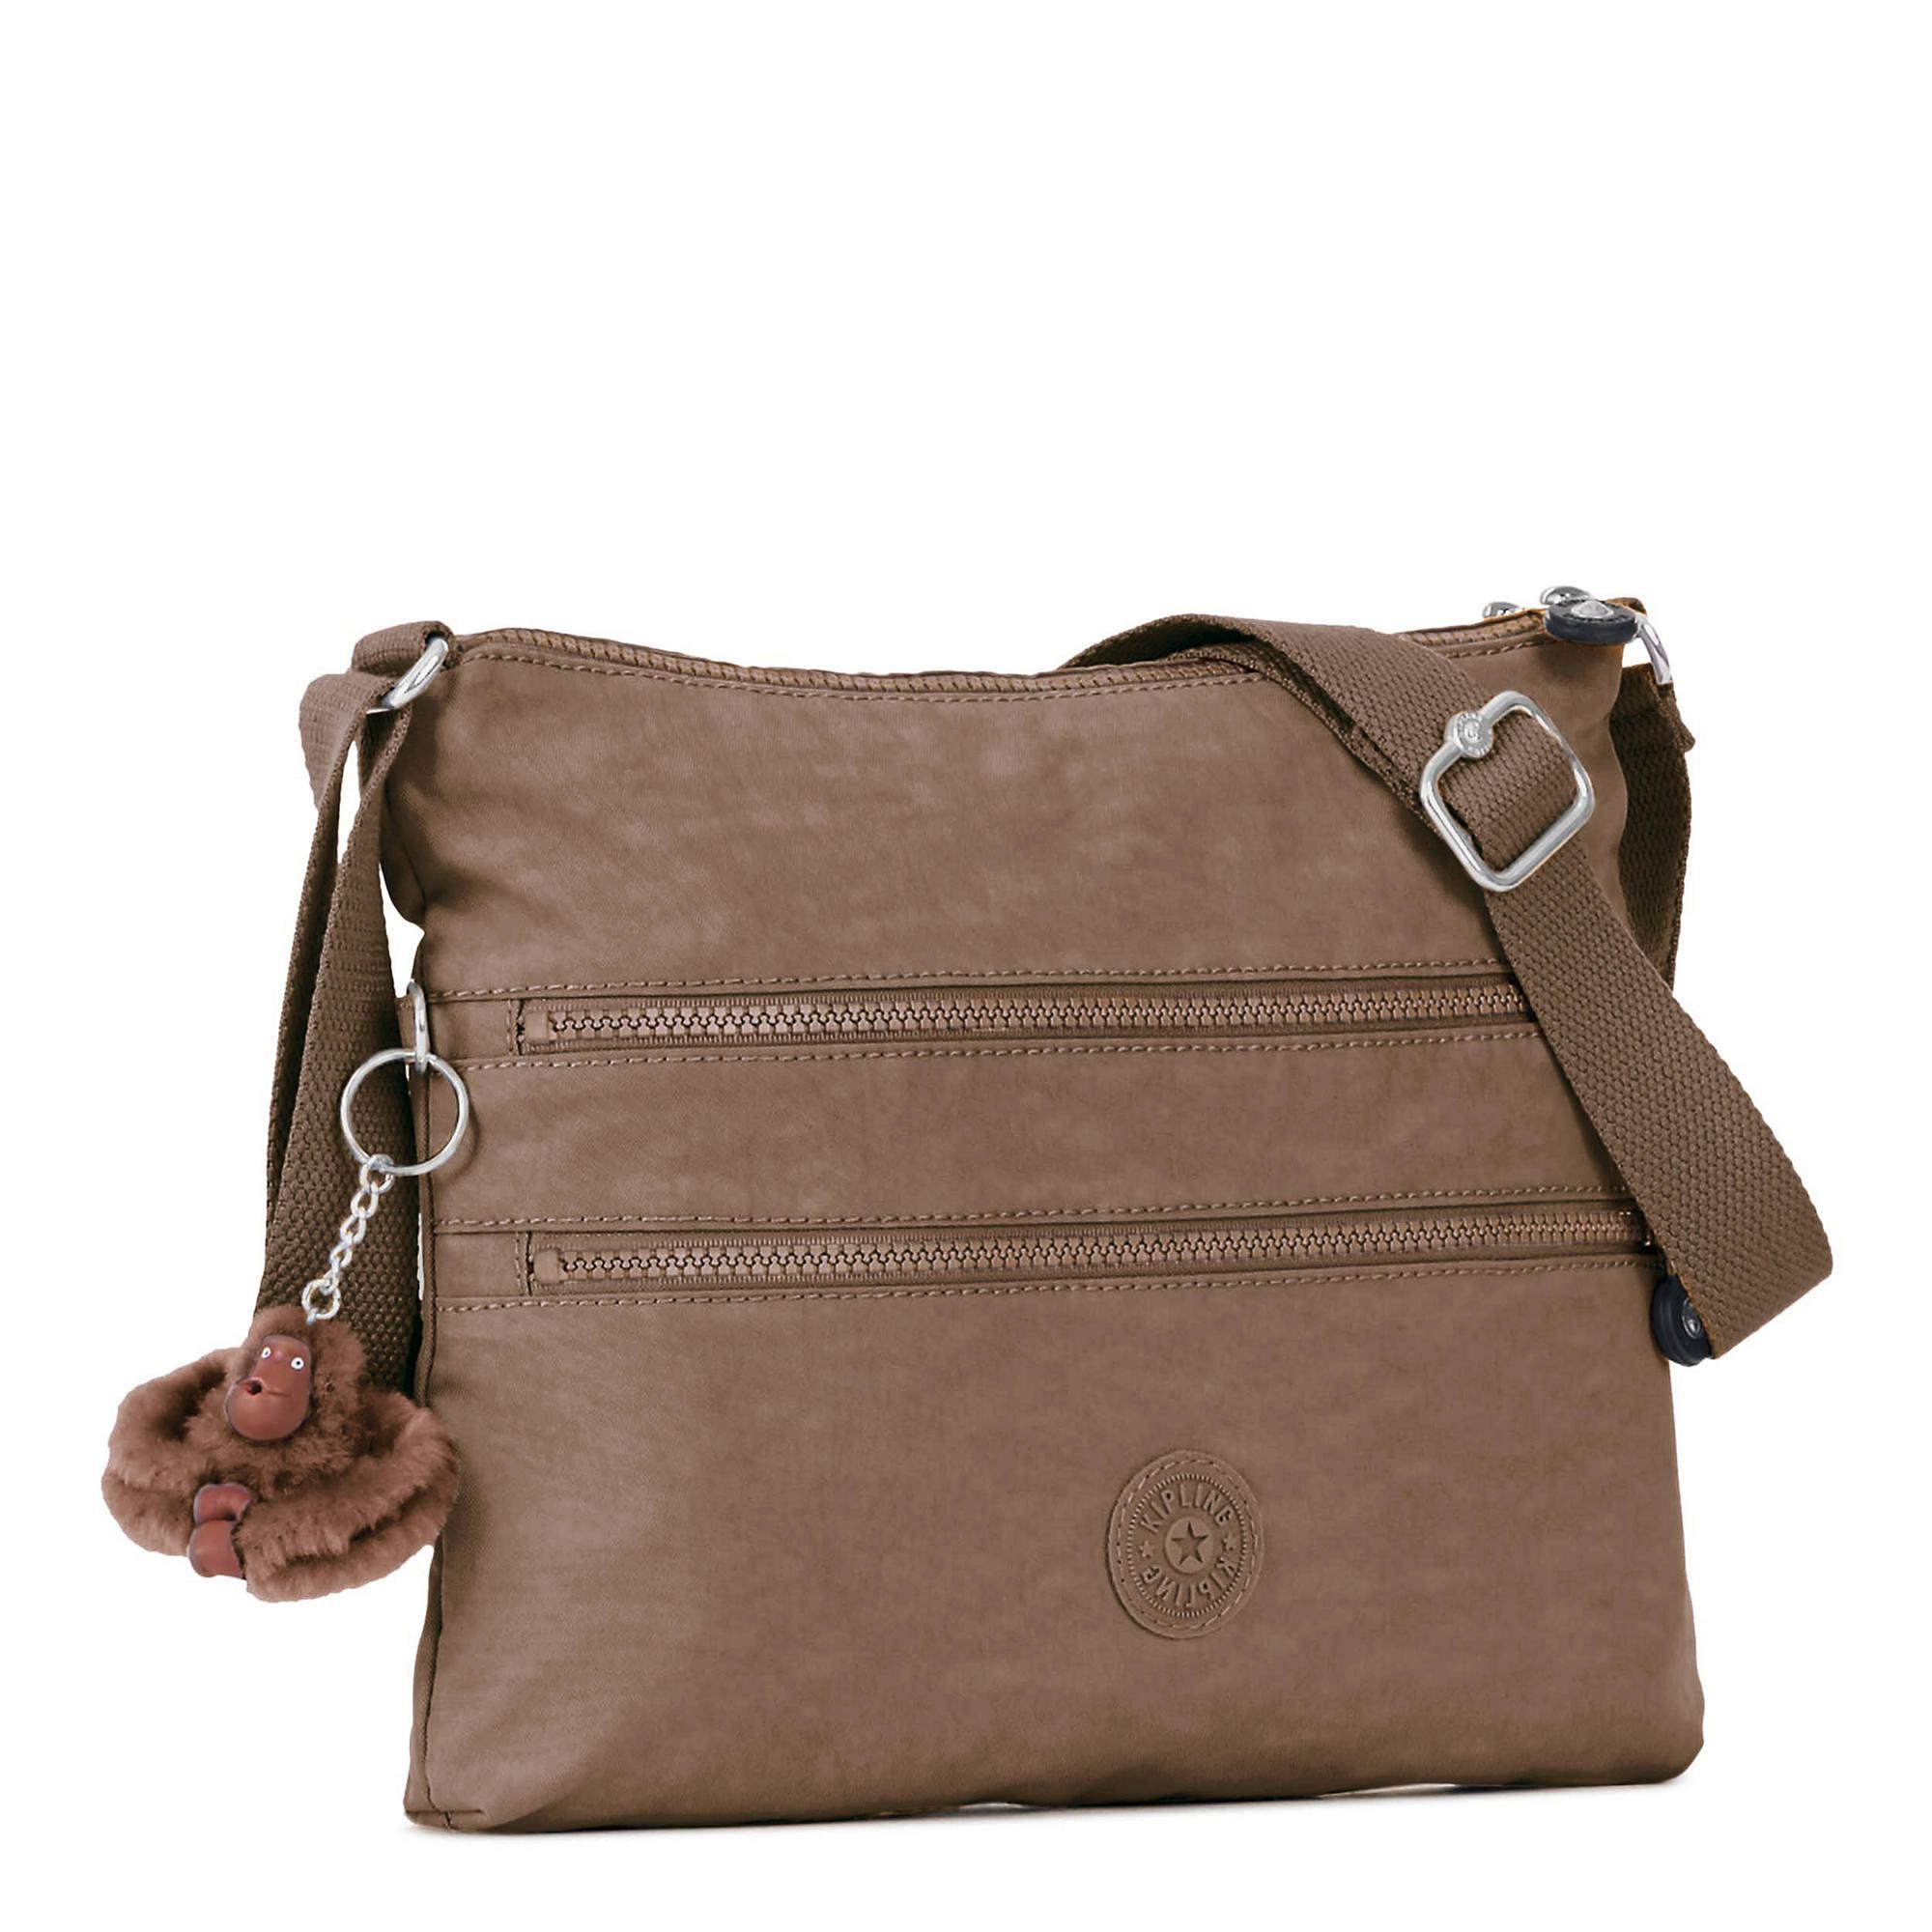 Kipling-Alvar-Metallic-Crossbody-Bag miniature 40